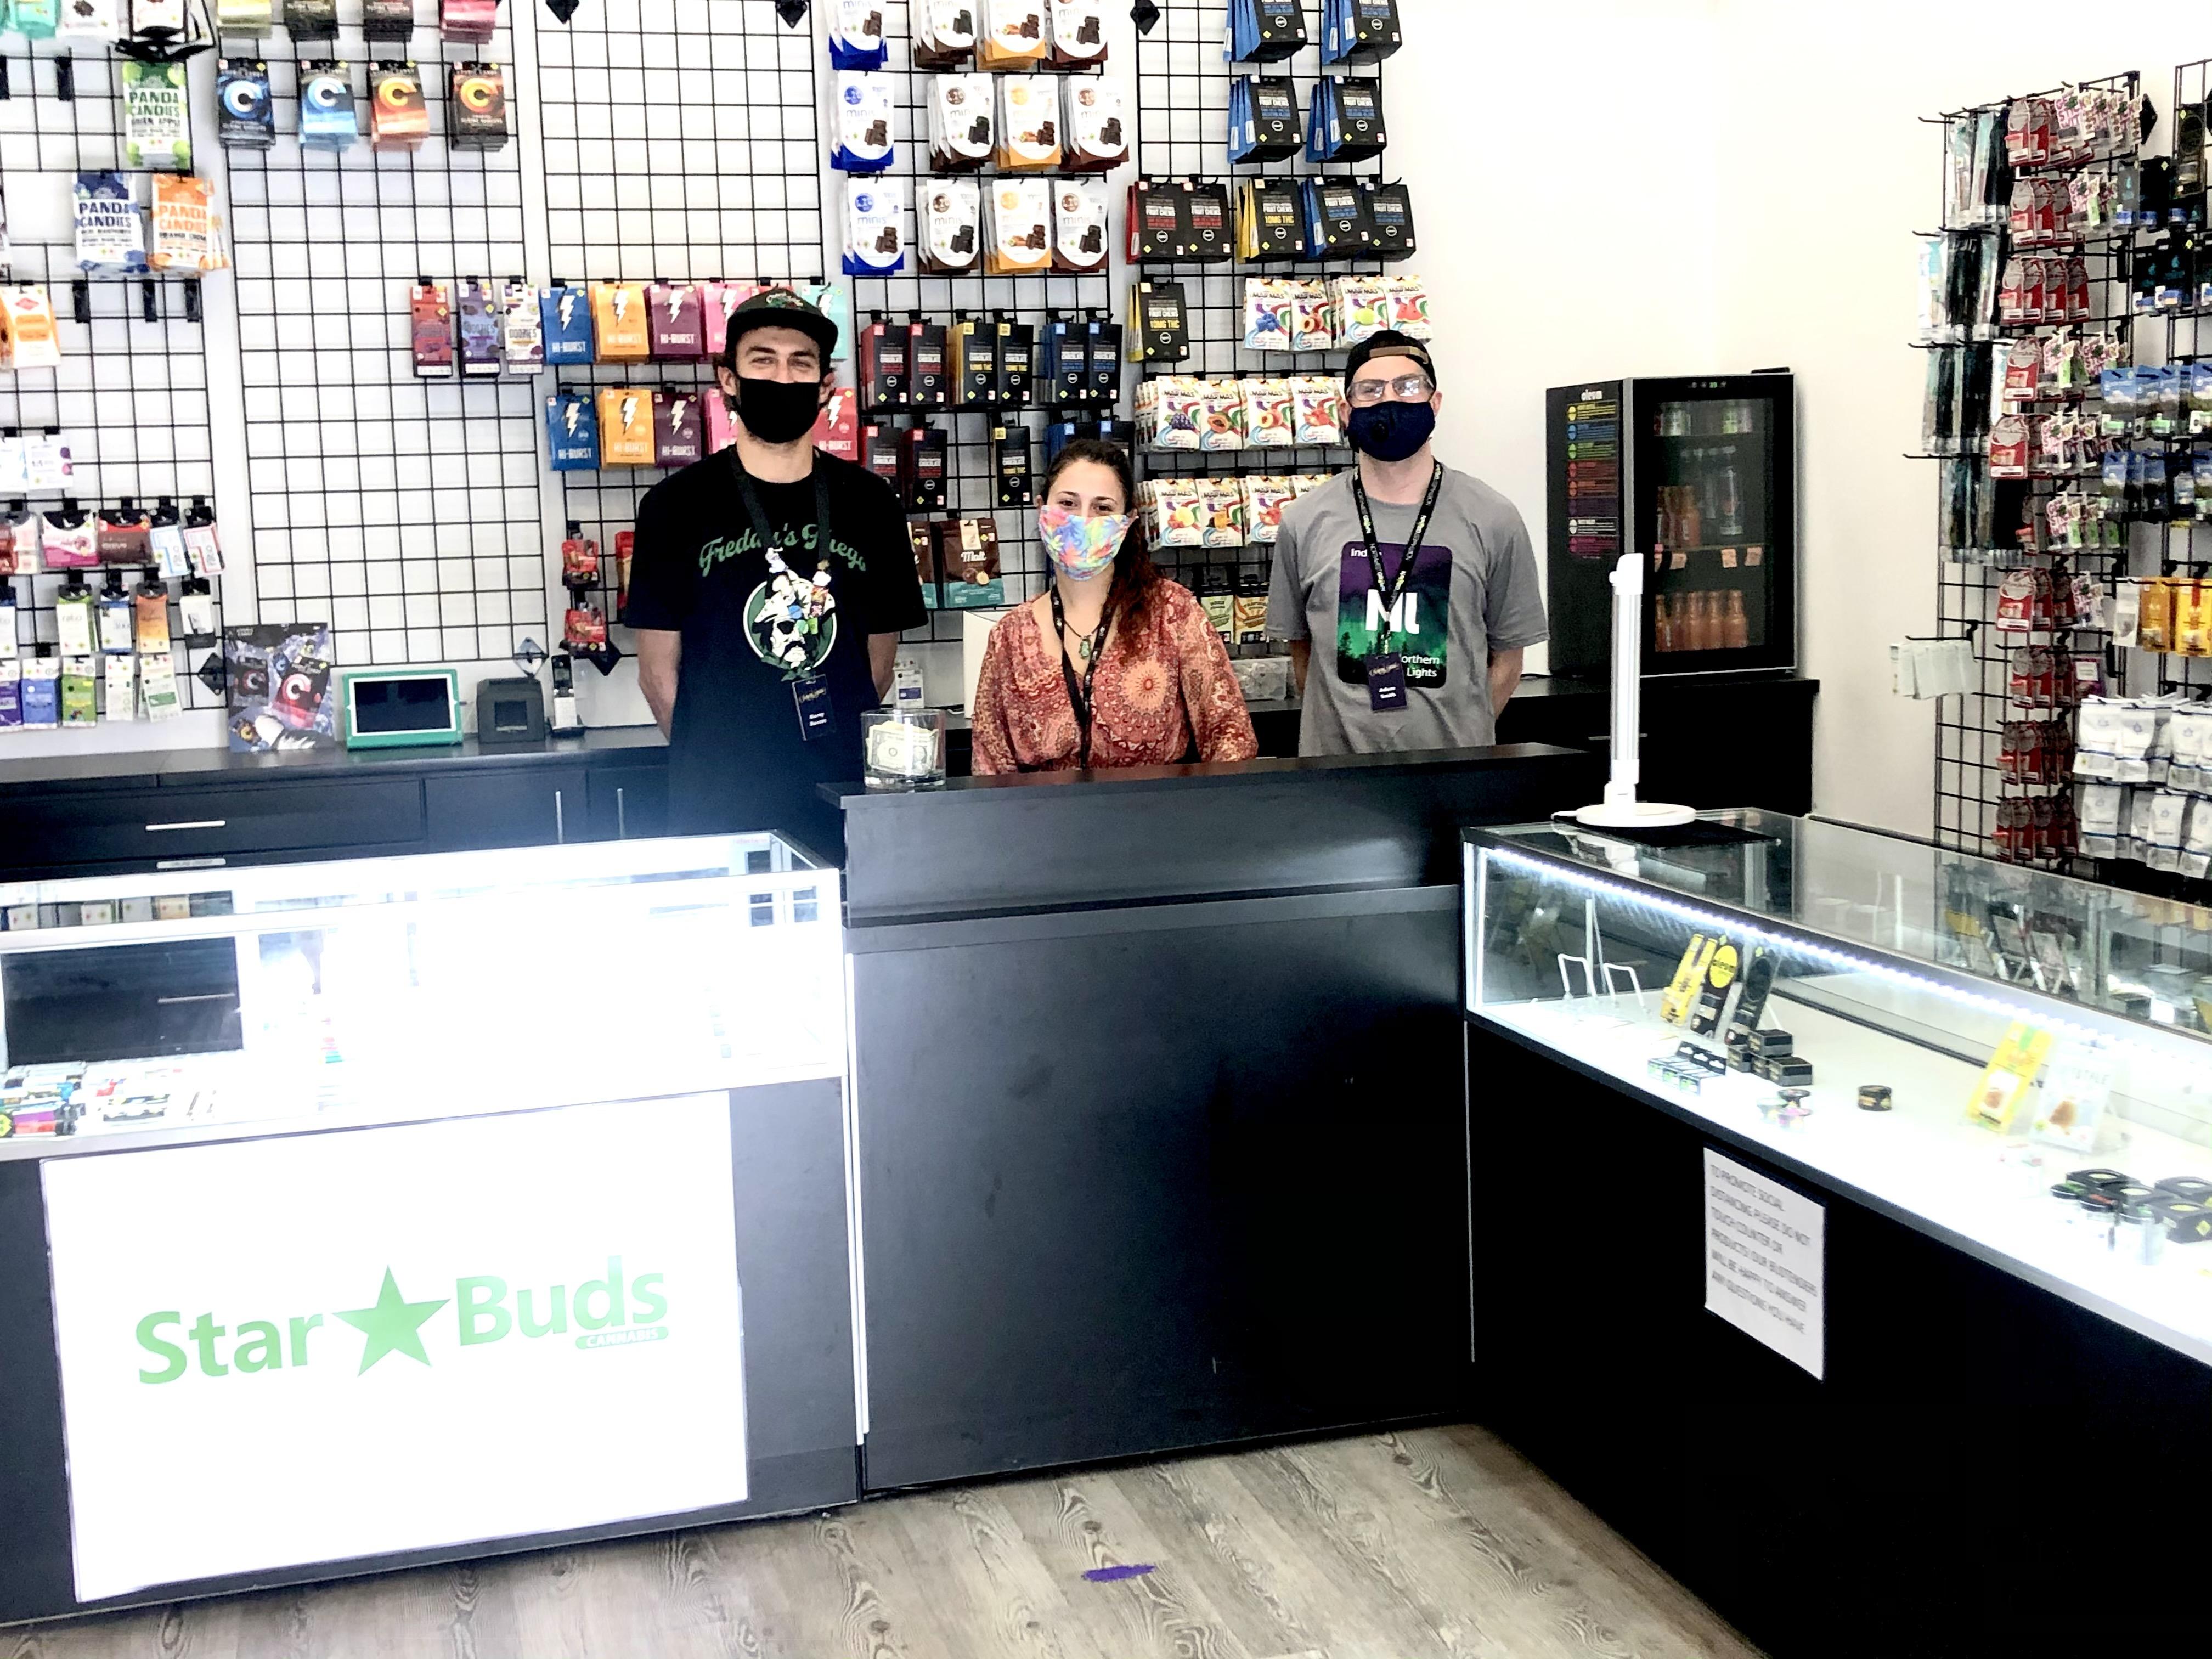 Star Buds Kirkland Budtenders inside the dispensary